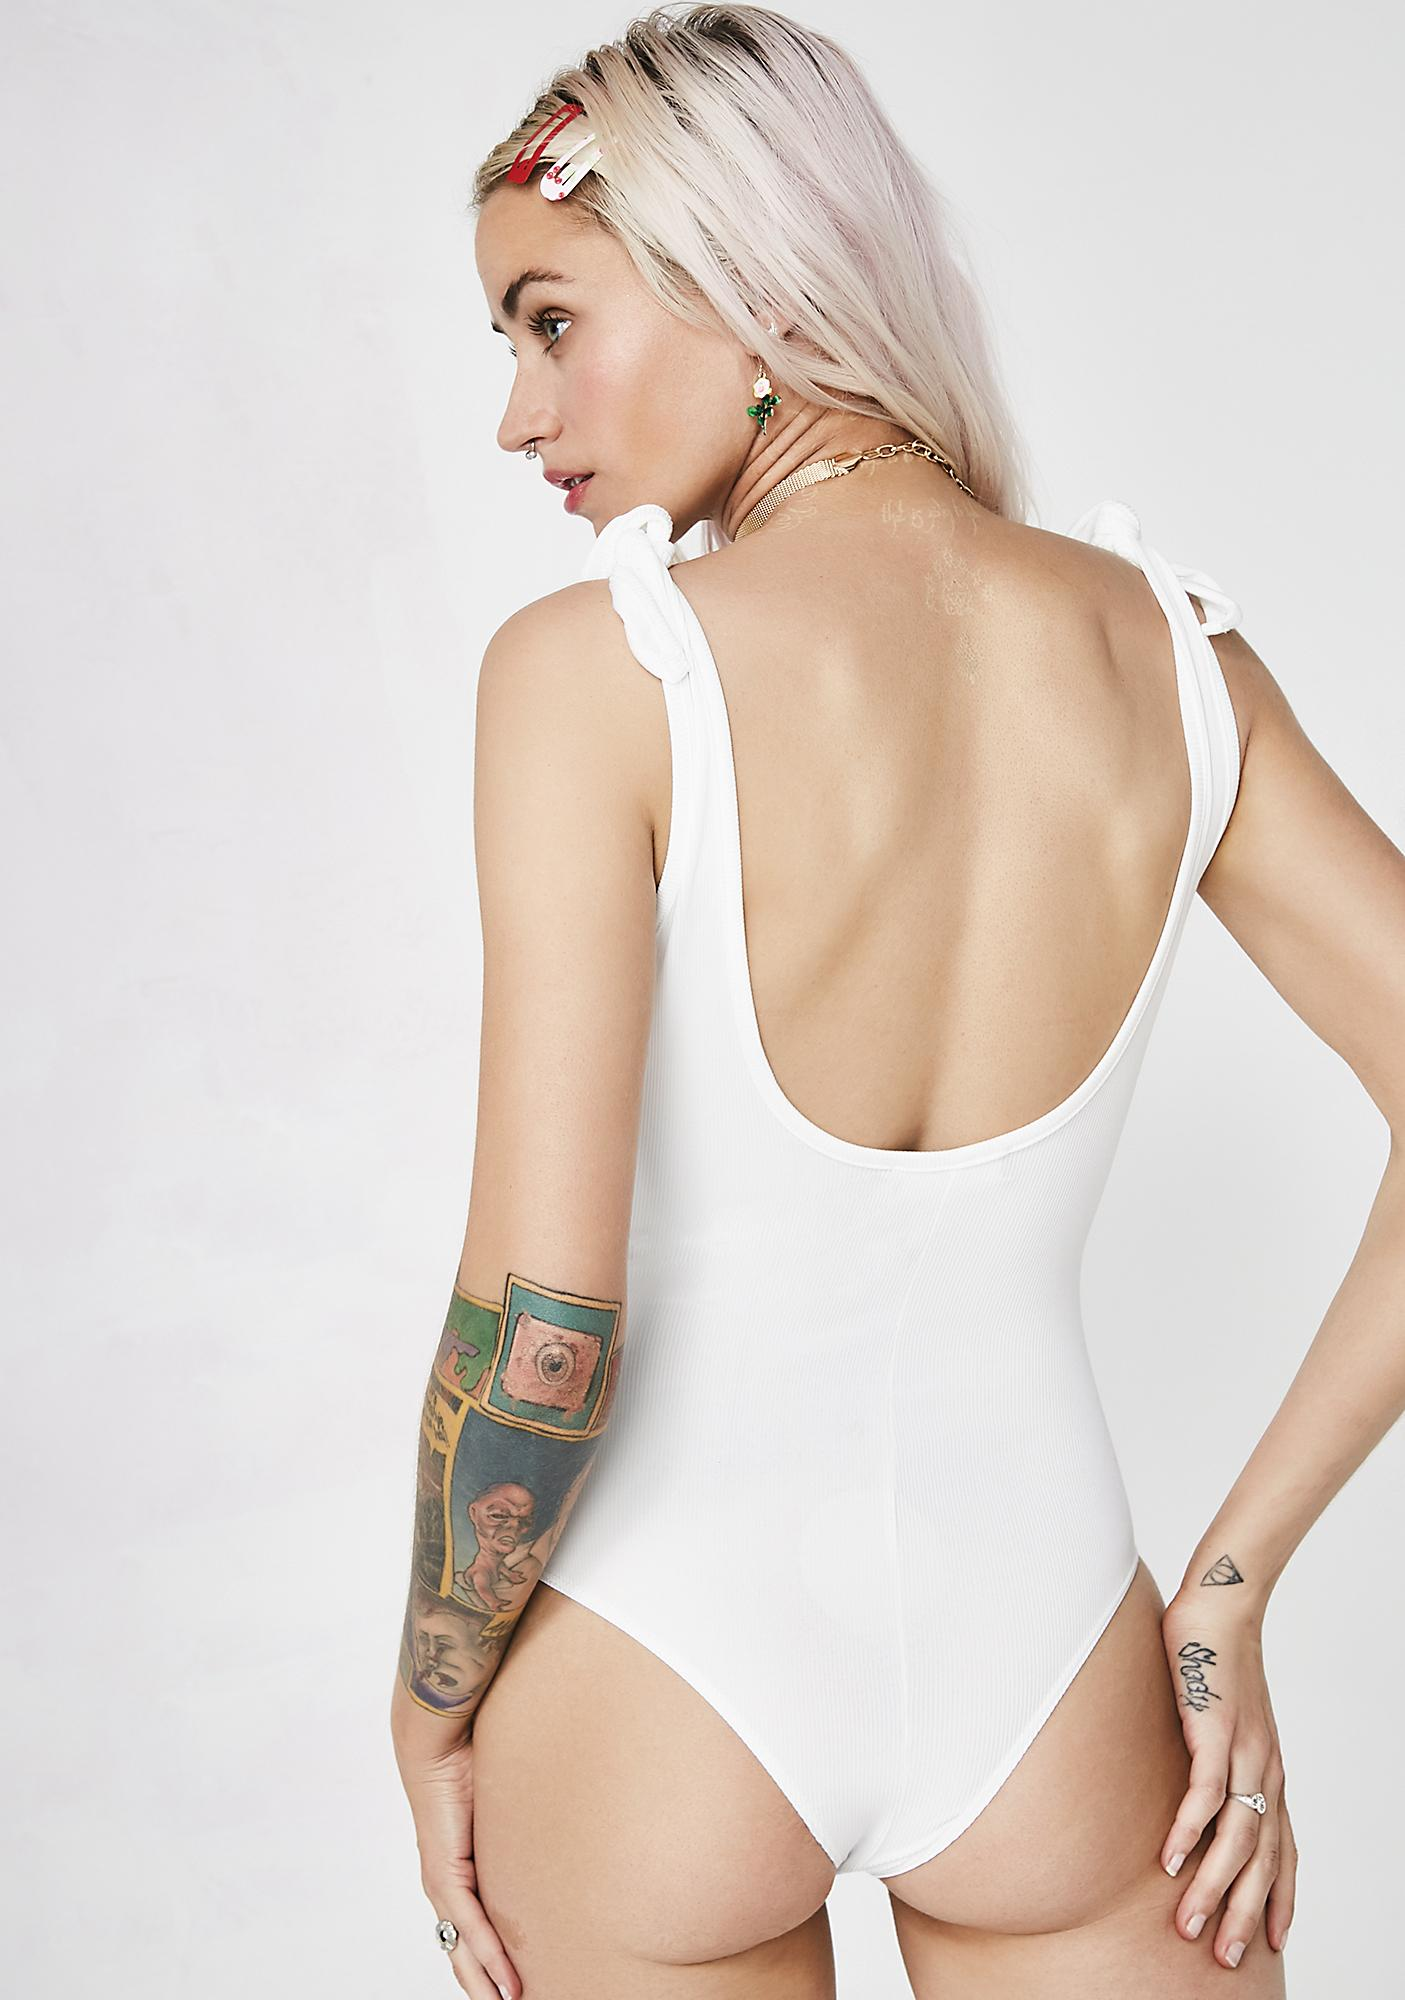 Tied Together Bodysuit